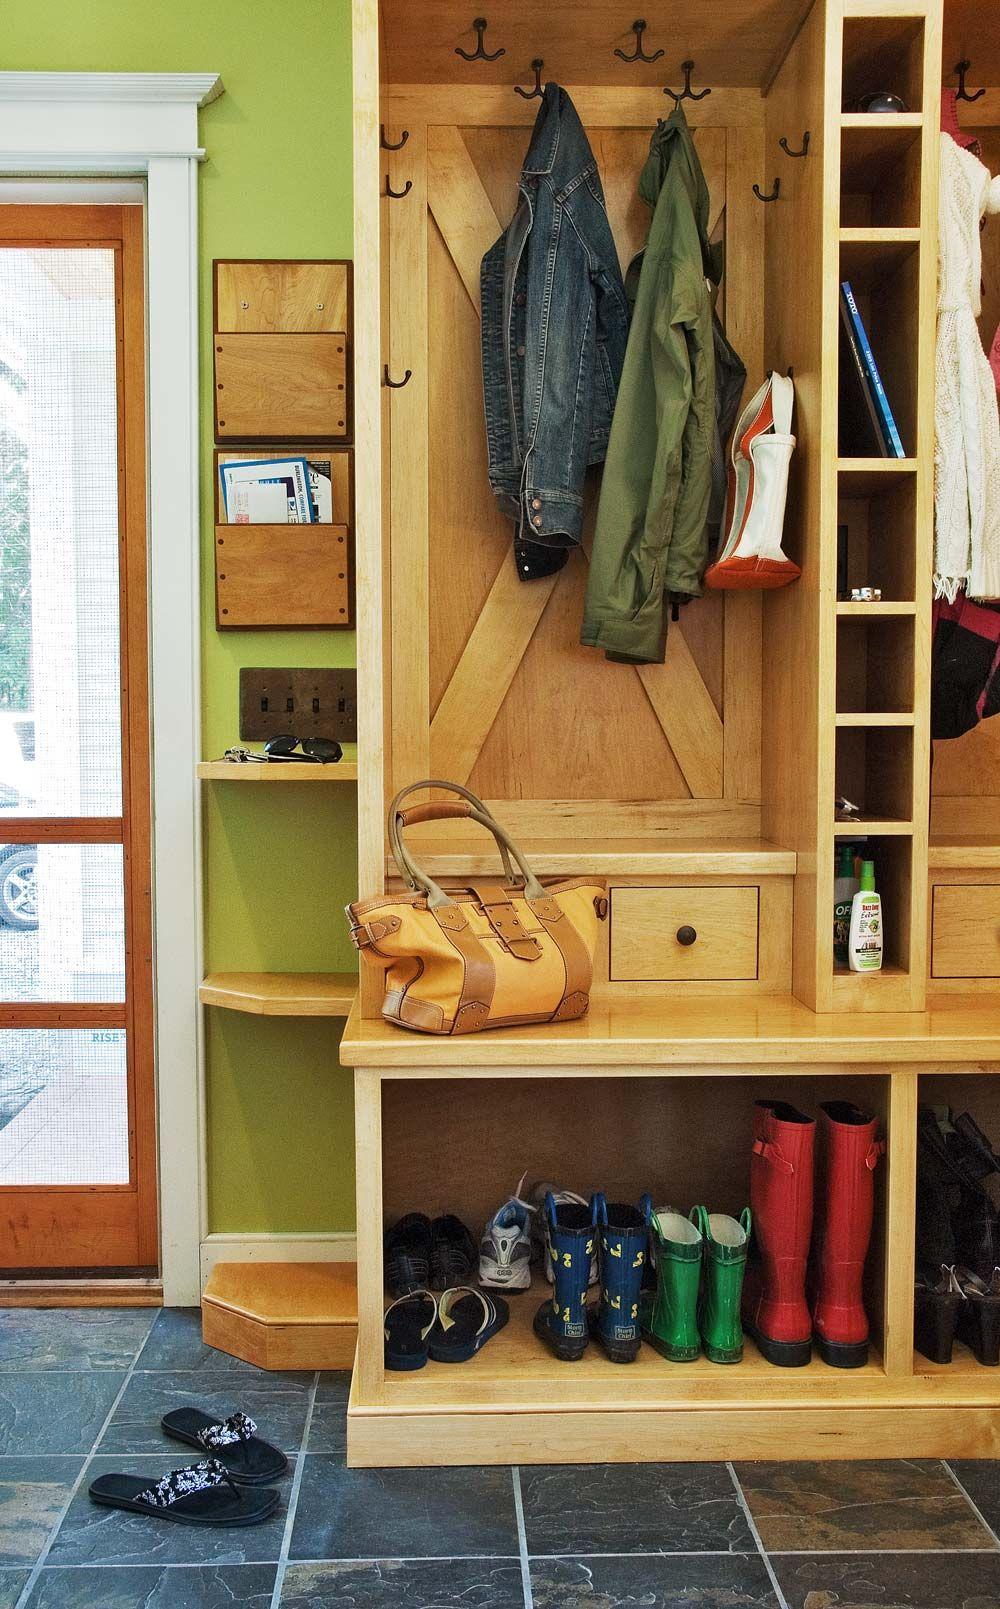 Mudroom lockers - Love the barn door look and boot space